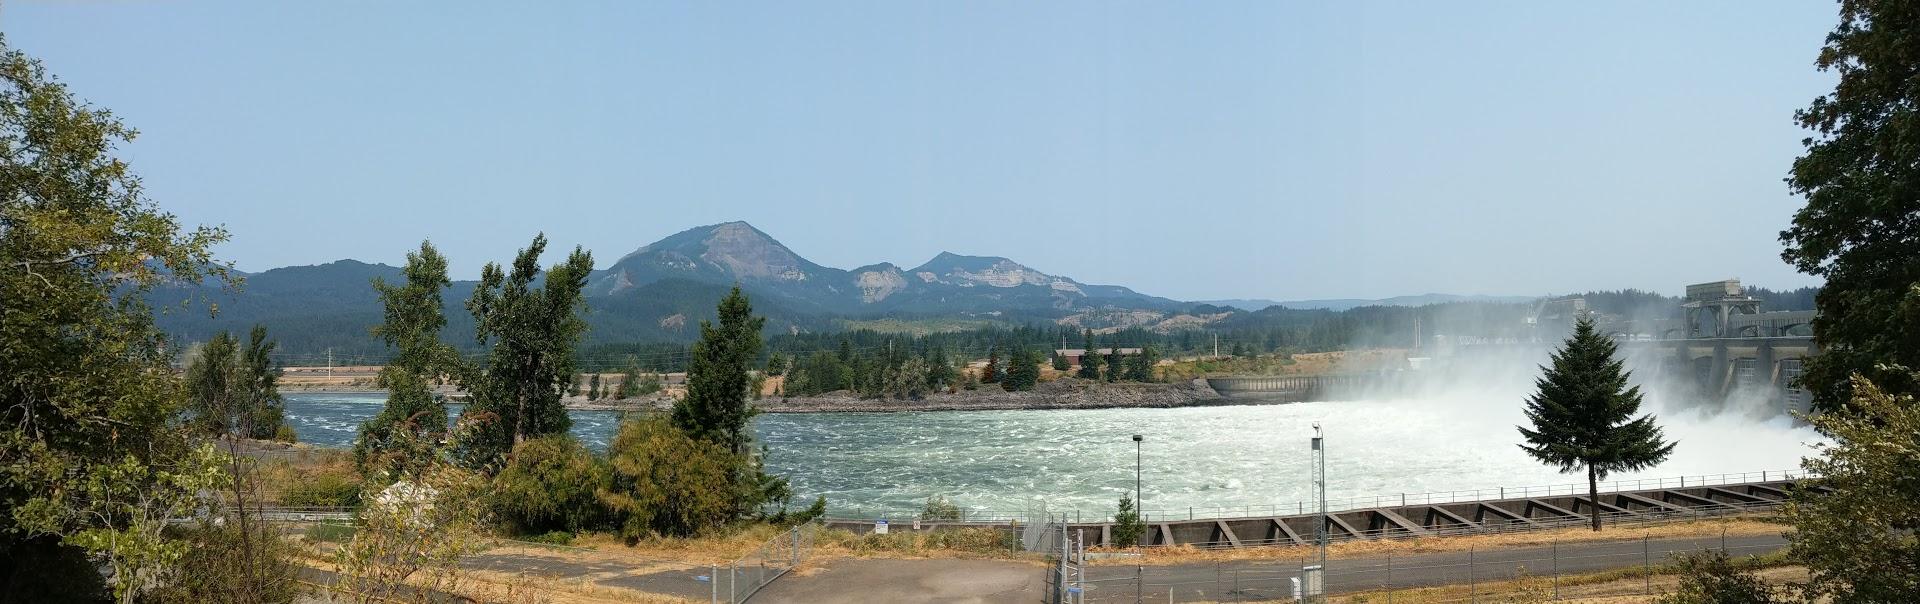 Bonnevilla Dam Panorama